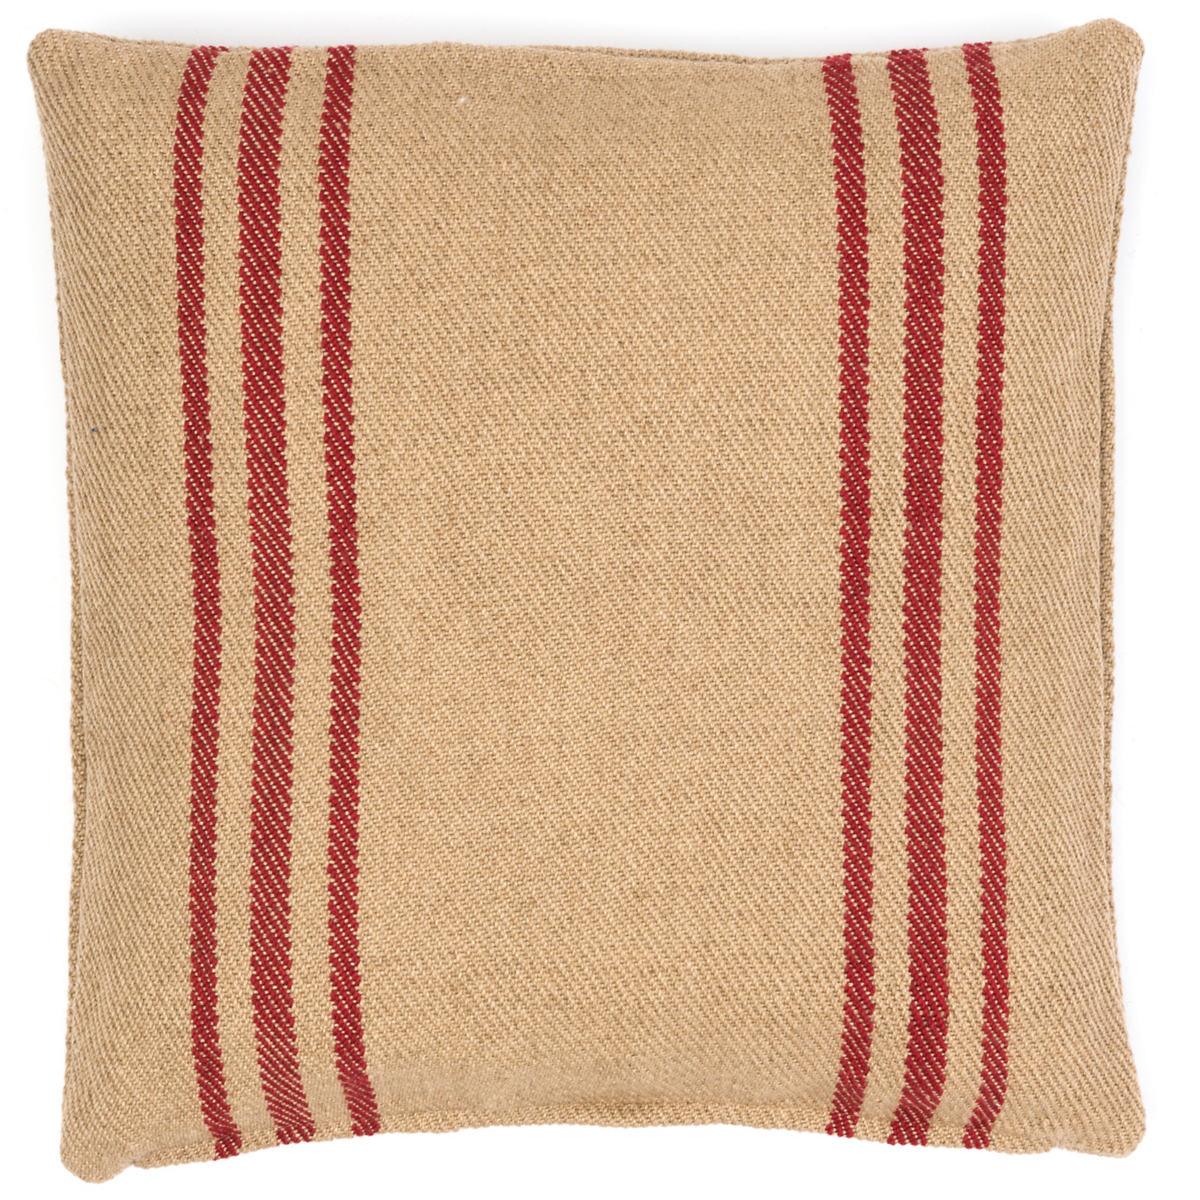 Cape Stripe Red/Camel Indoor/Outdoor Pillow